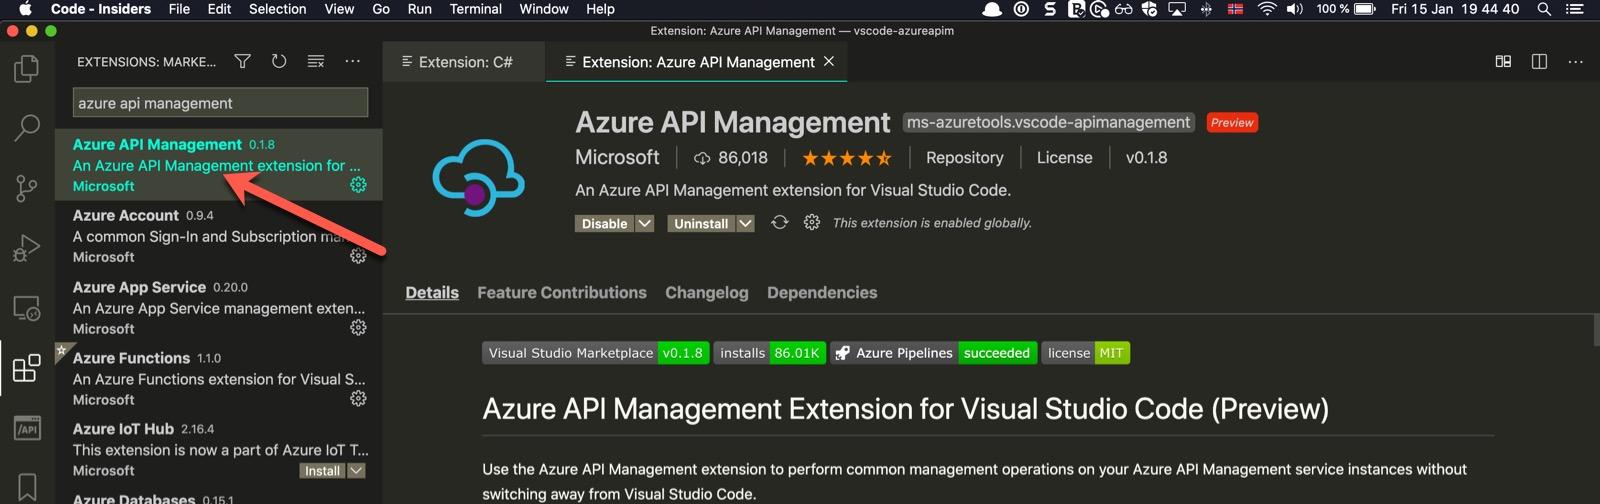 VSCode extension for Azure API Management